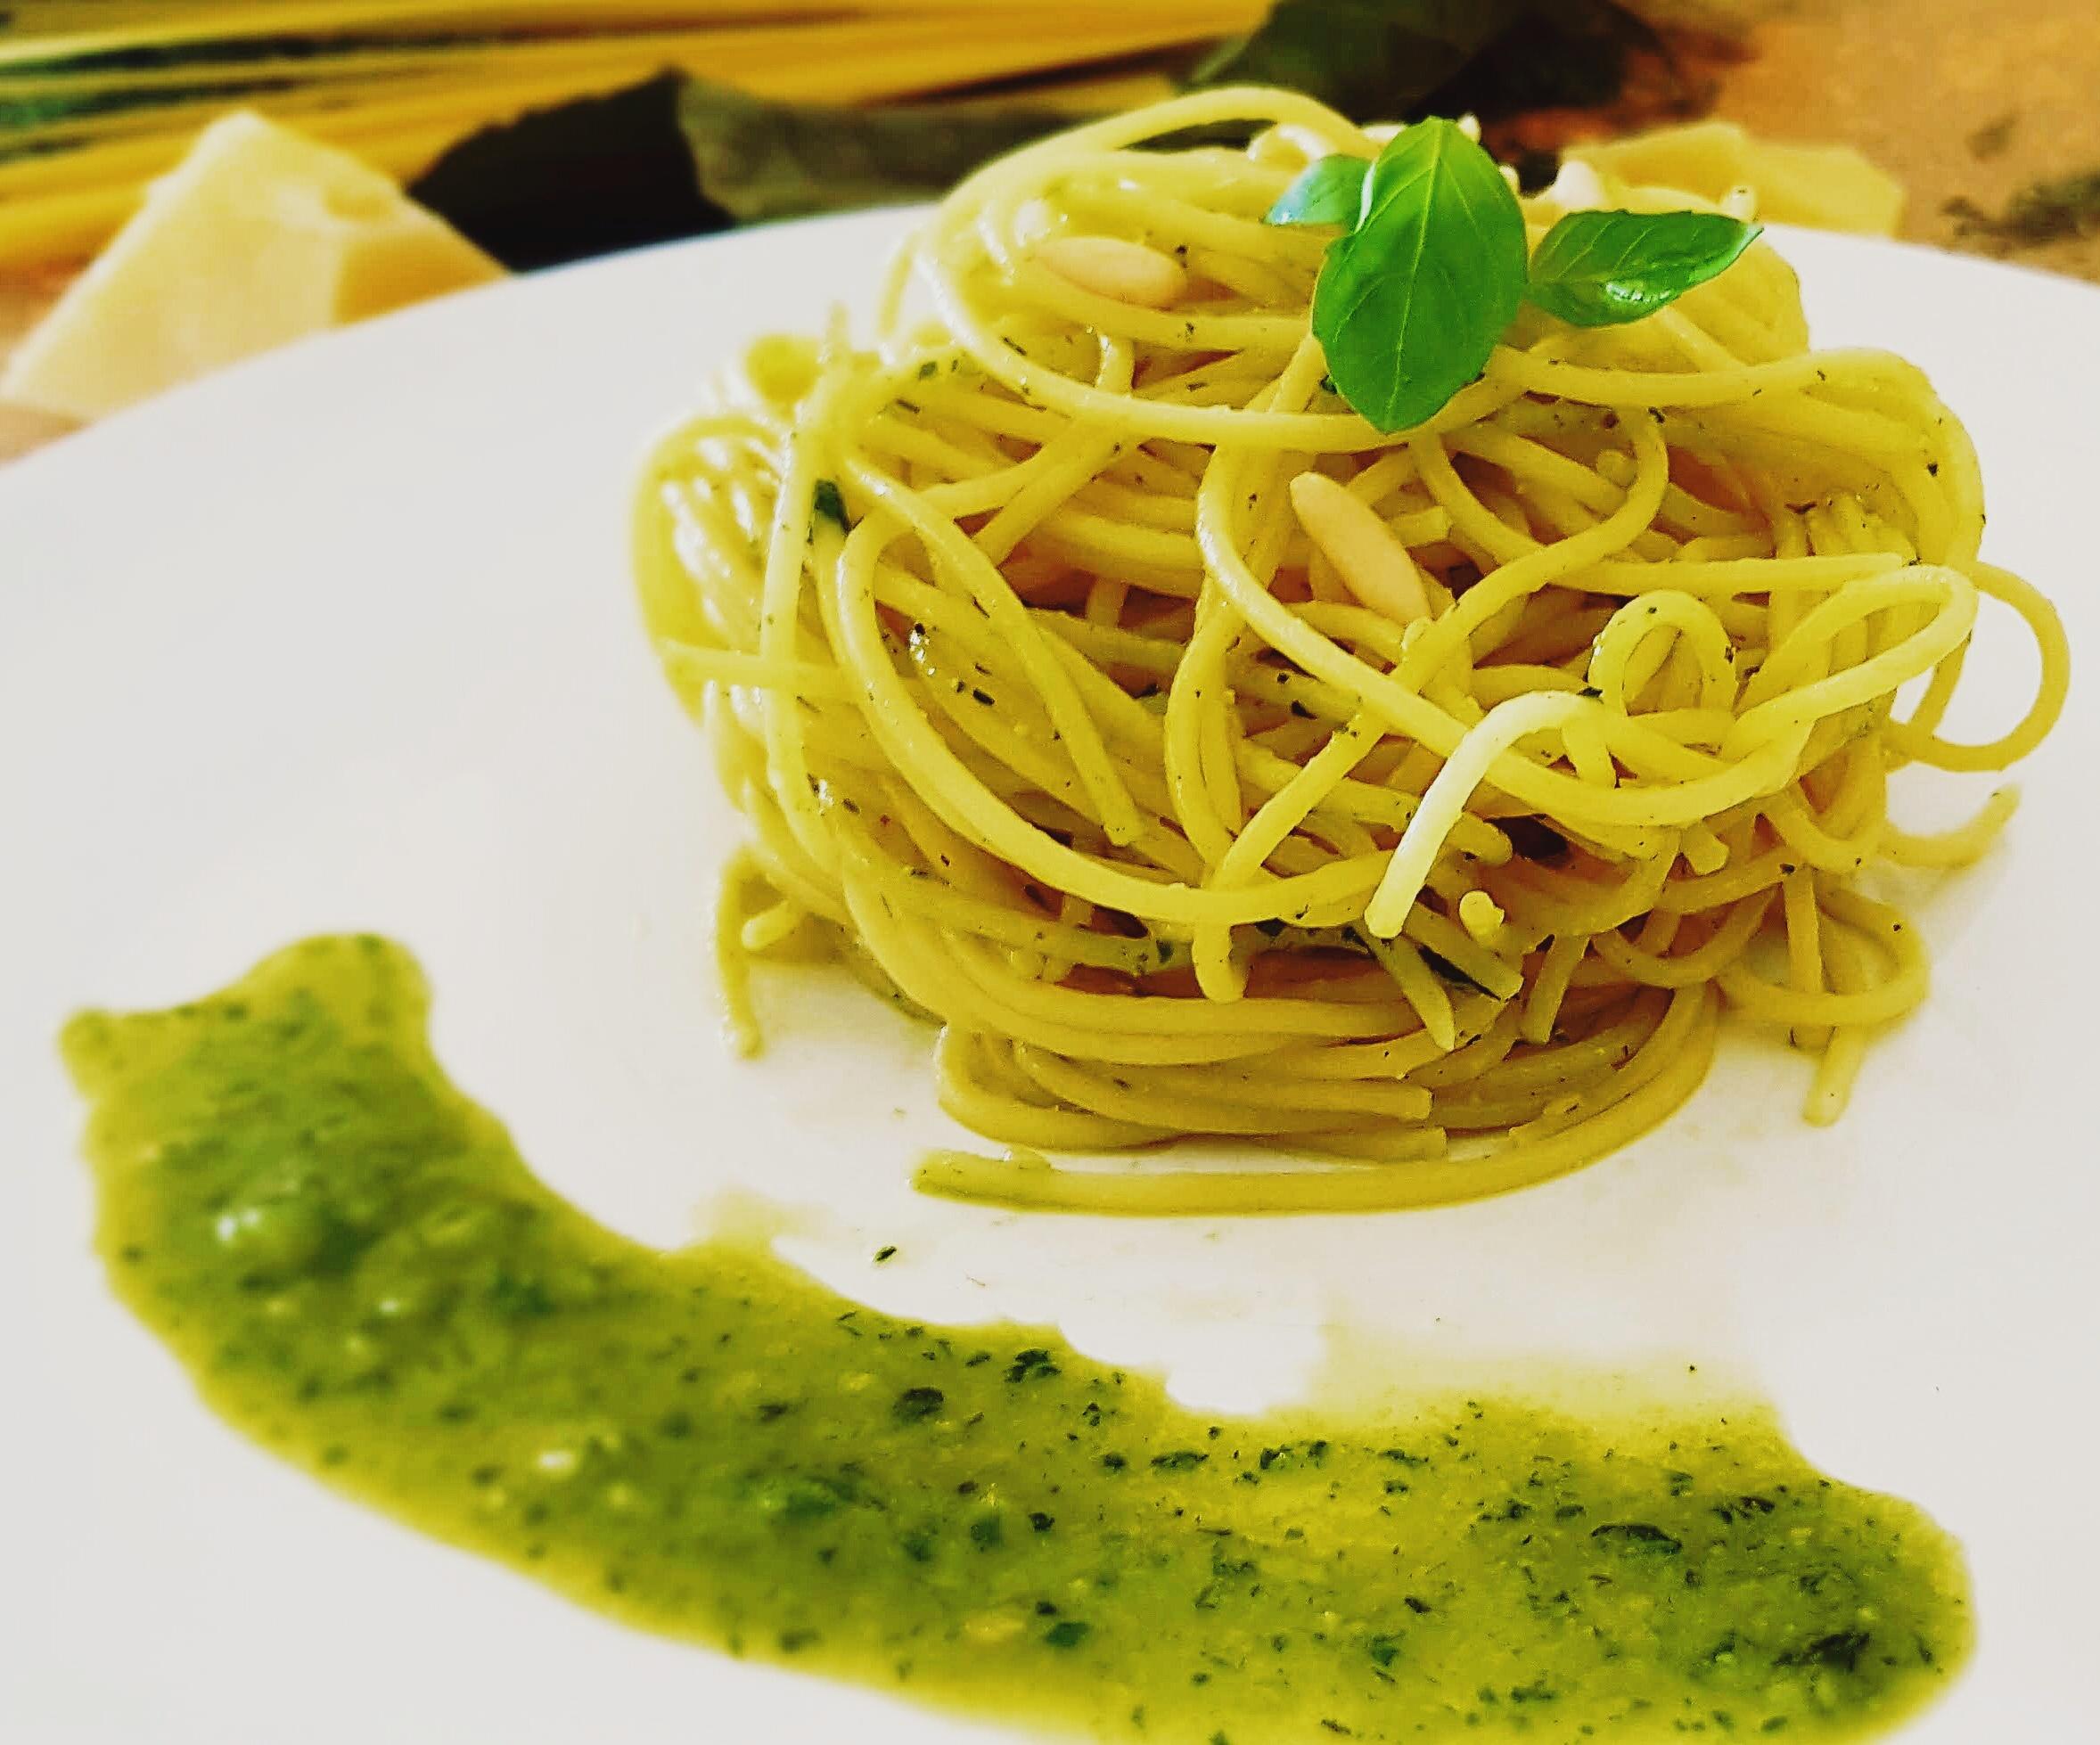 Aceite de oliva, ajo, piñones, rúcula, y queso pecorino romano.